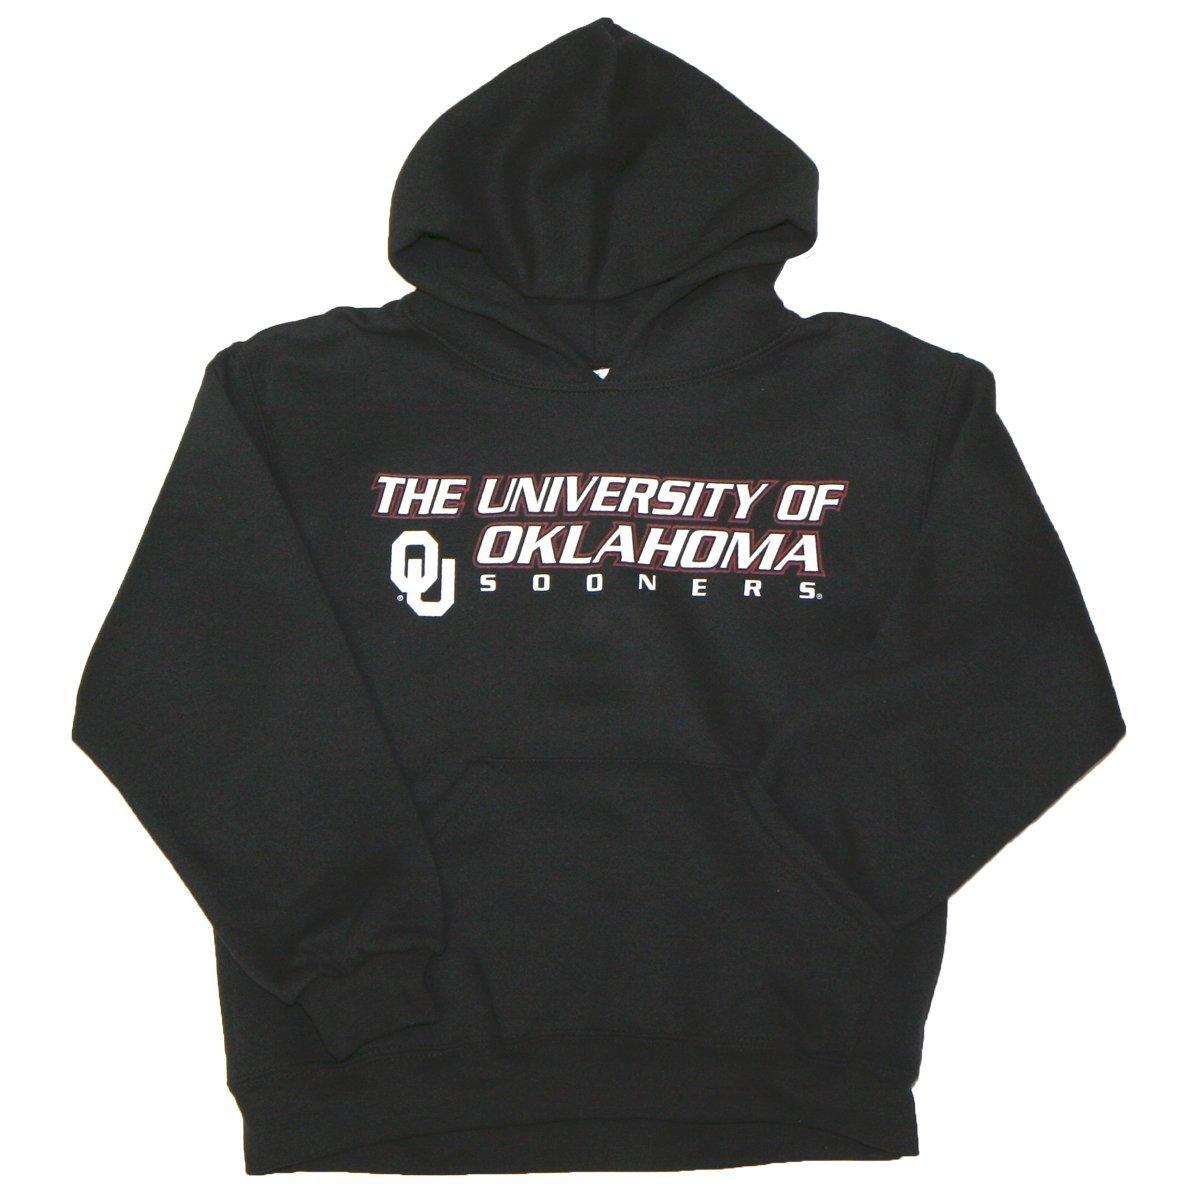 OKLAHOMA SOONERS Team Youth Hooded Sweatshirt XL (18-20) Black MJ Soffe HOODIE BRAND NEW!